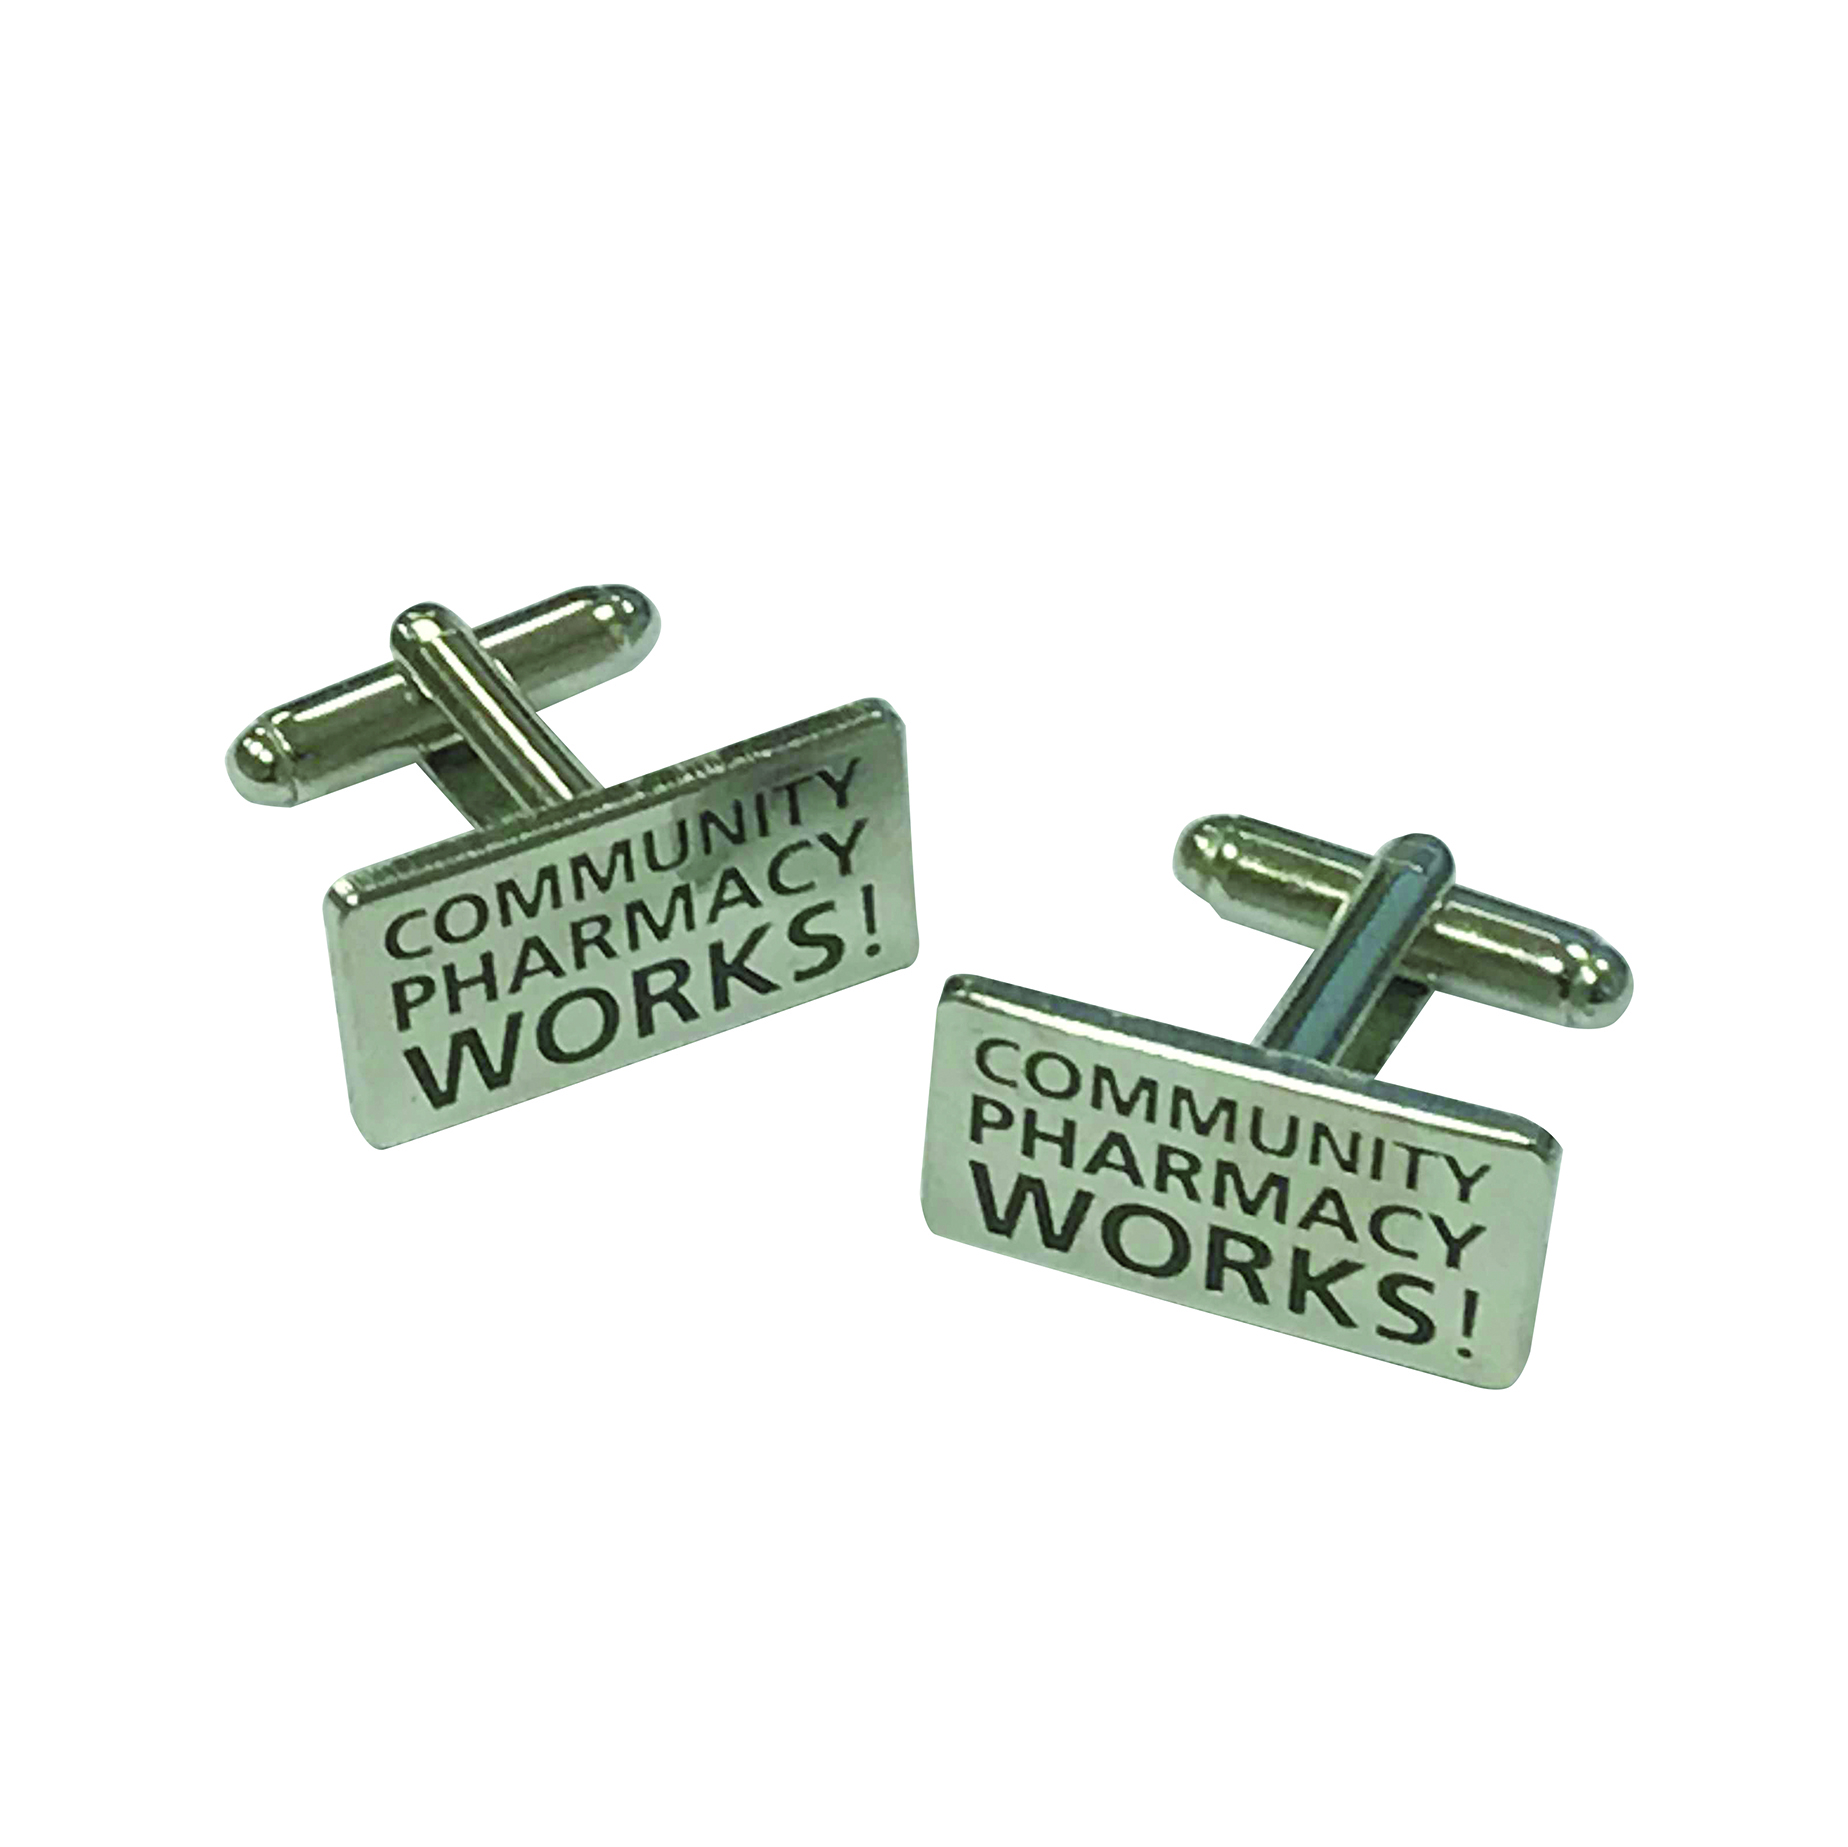 COMMUNITY PHARMACY WORKS! Enamel cufflinks